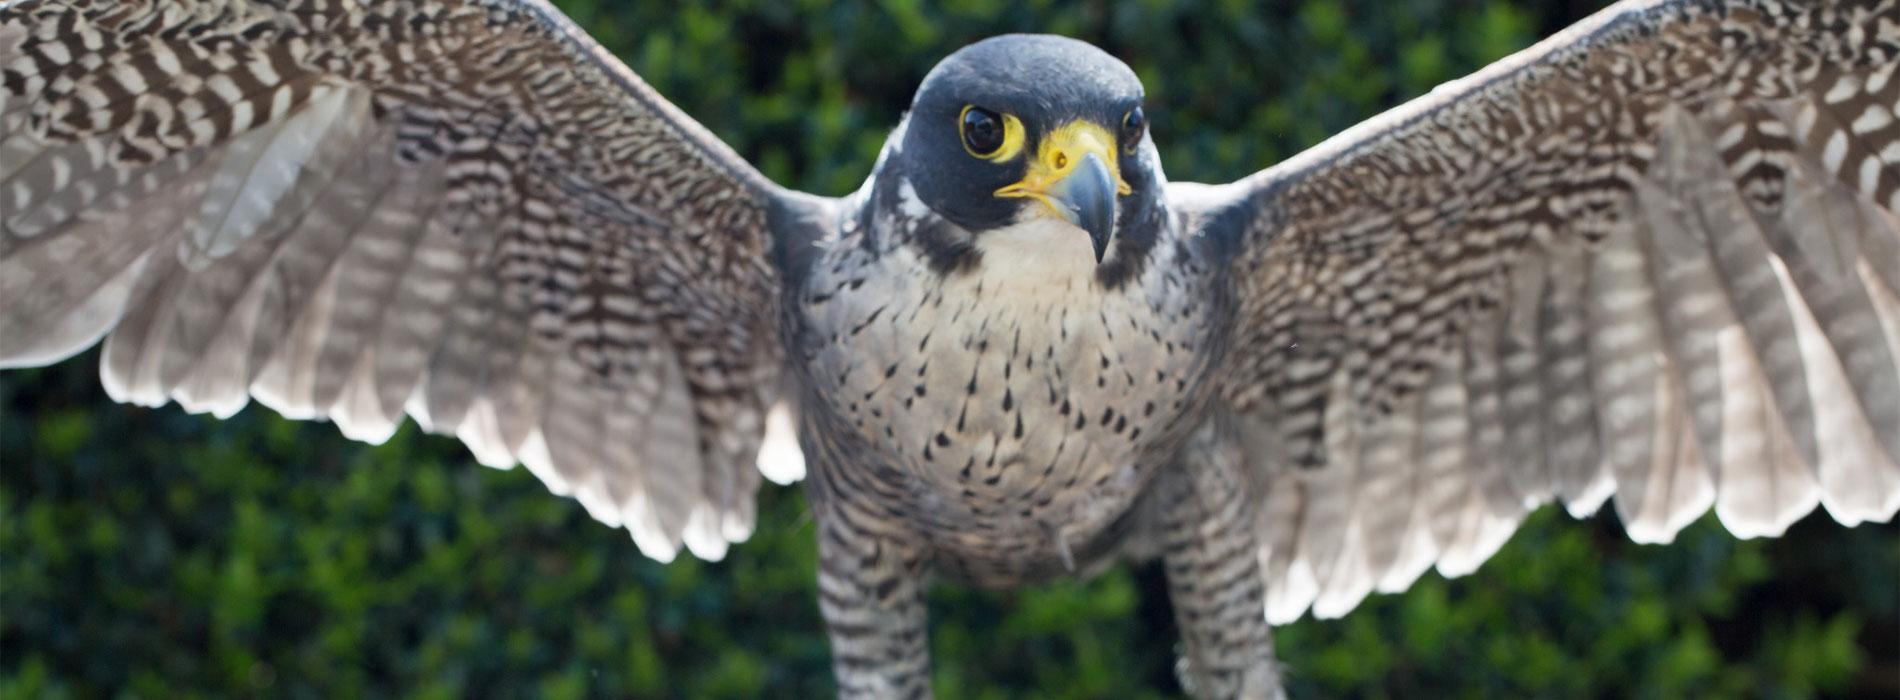 Falcon wingspan